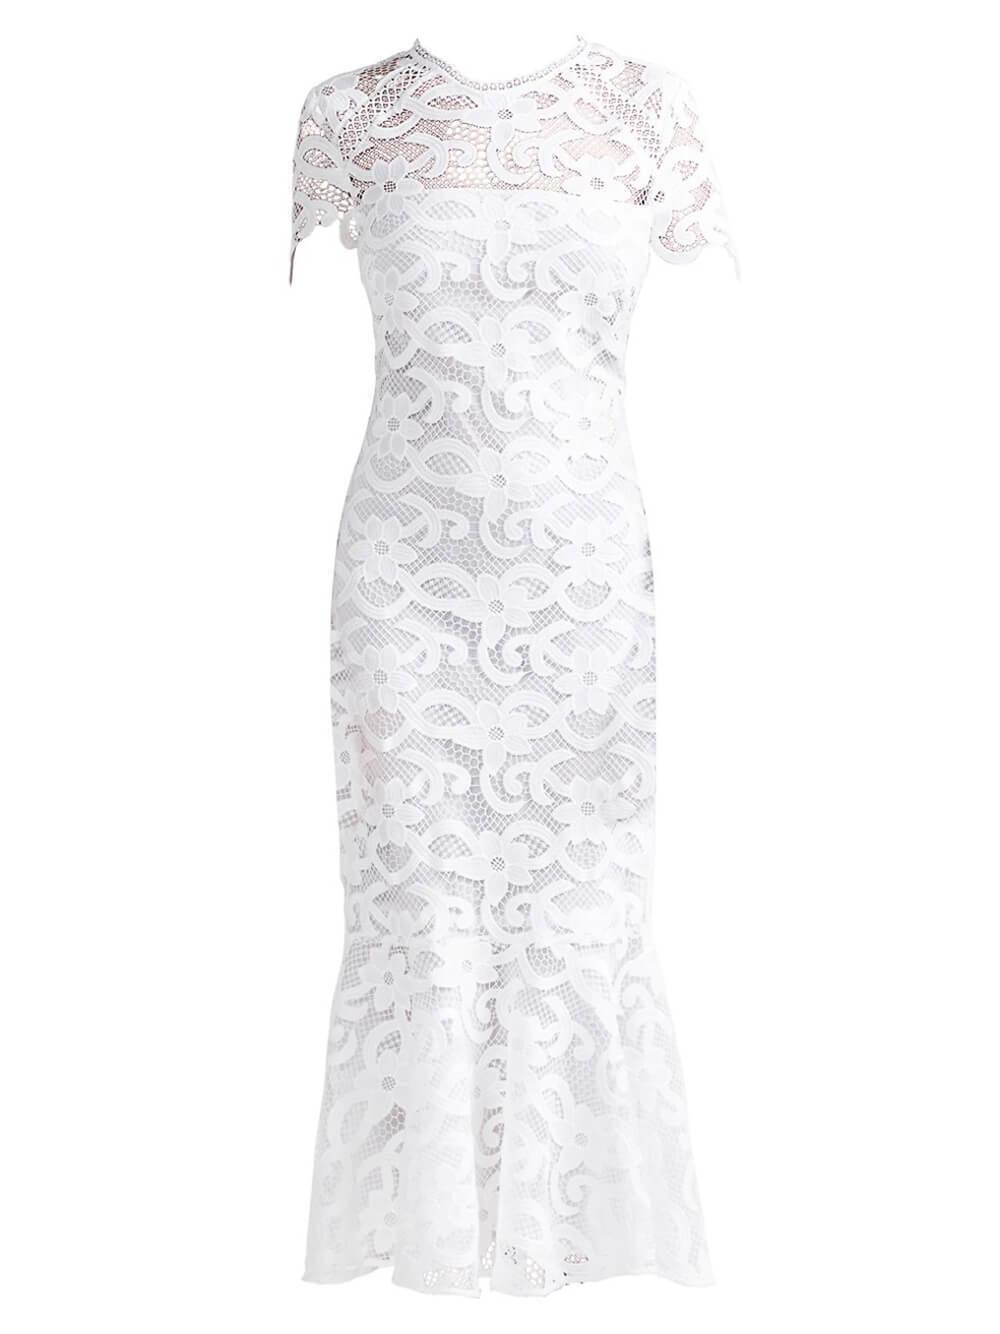 Crance Midi Dress Item # 6099255